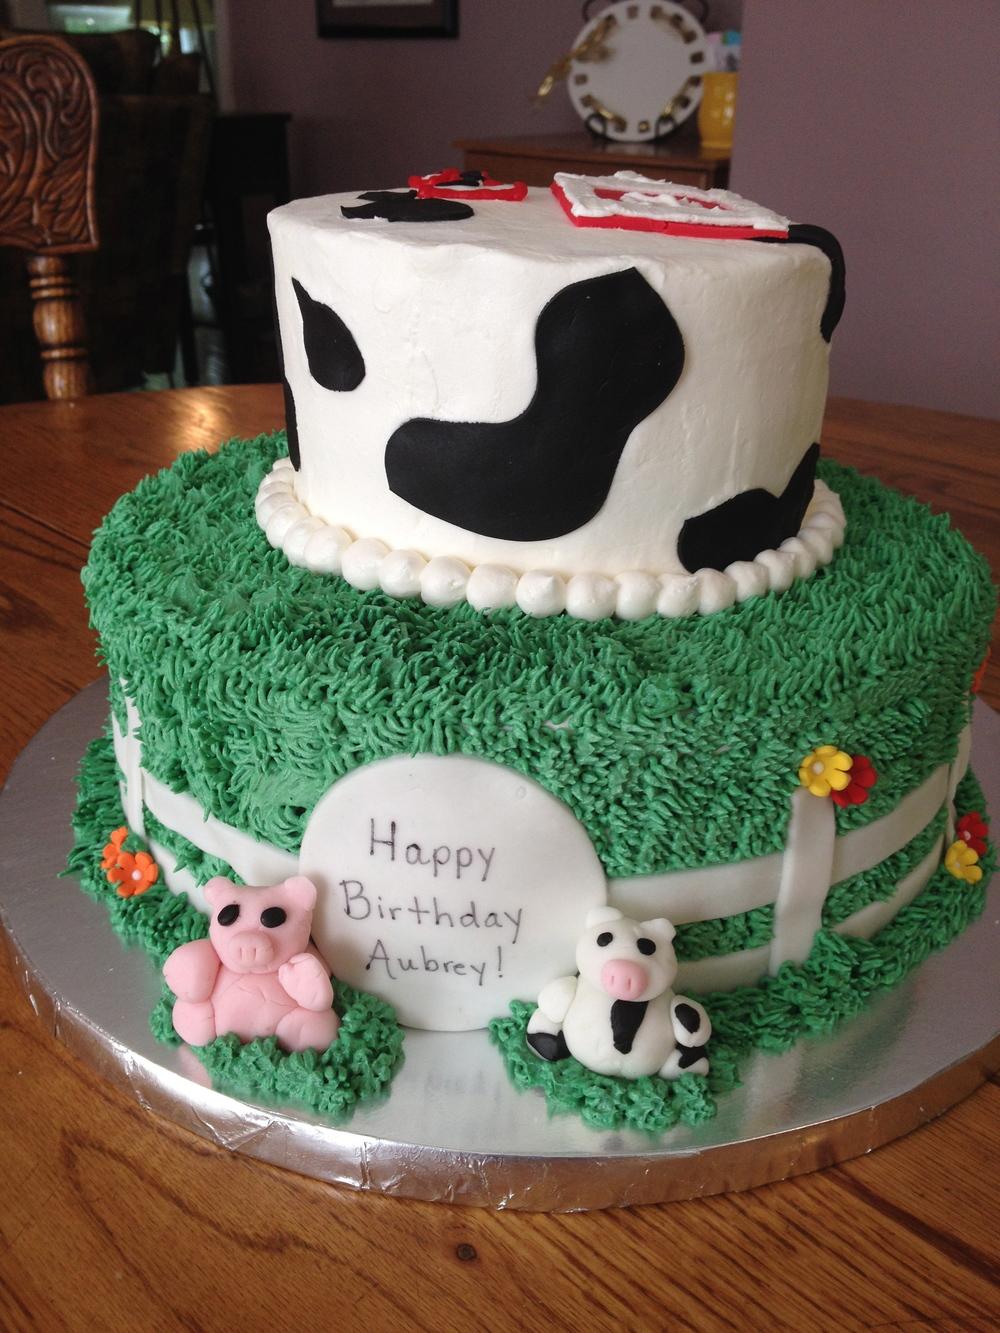 Barnyard-themed birthday cake for Aubrey